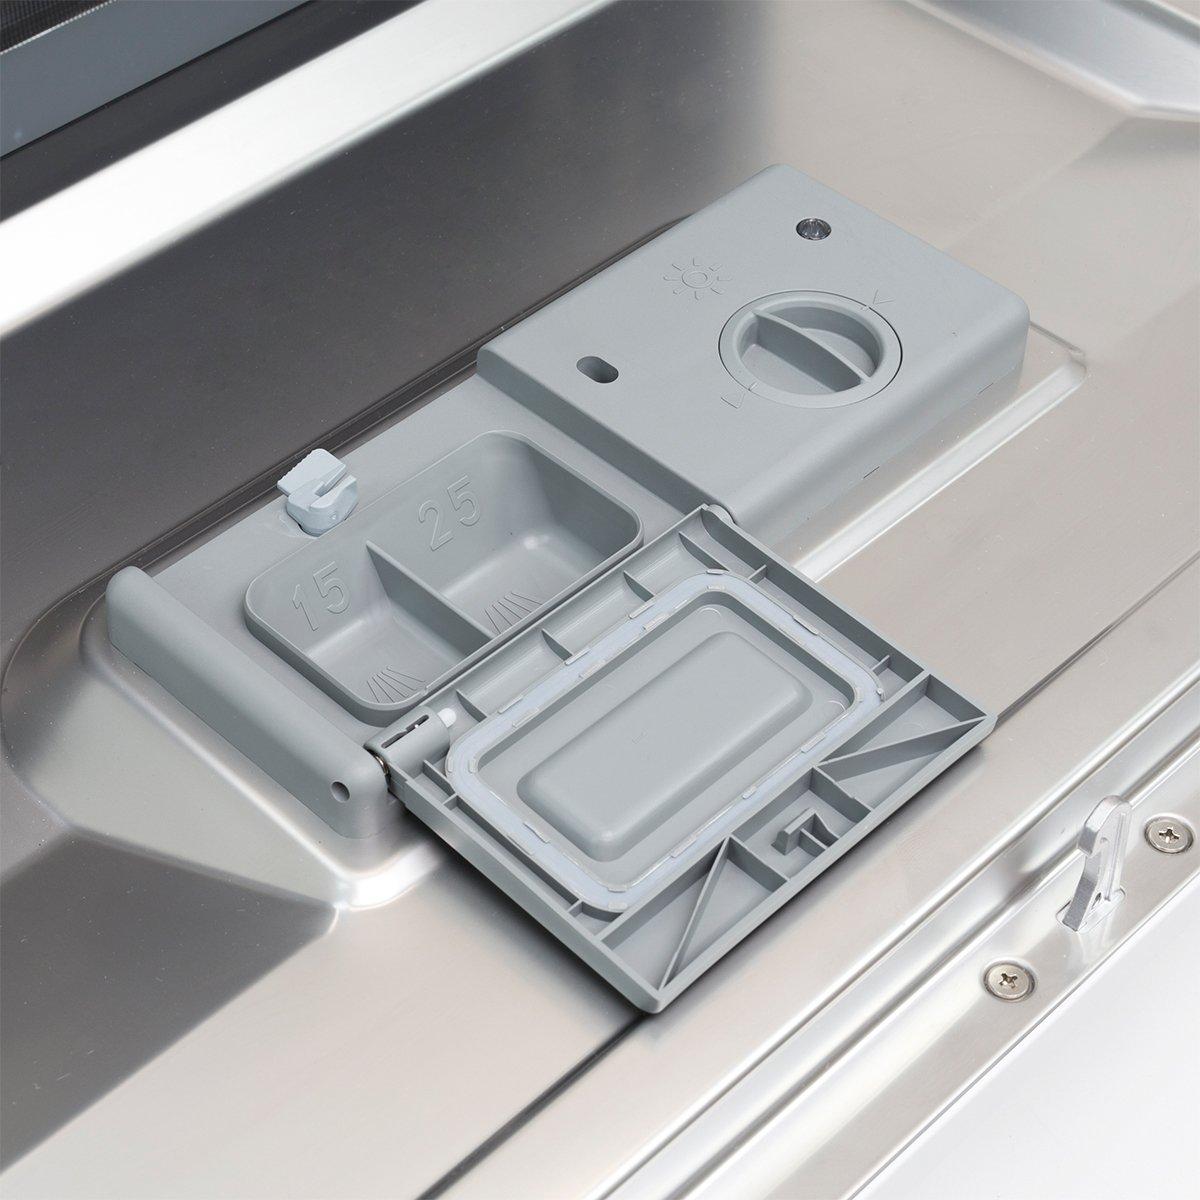 Ensue Countertop Dishwasher Portable Compact Dishwashing Machine Silver